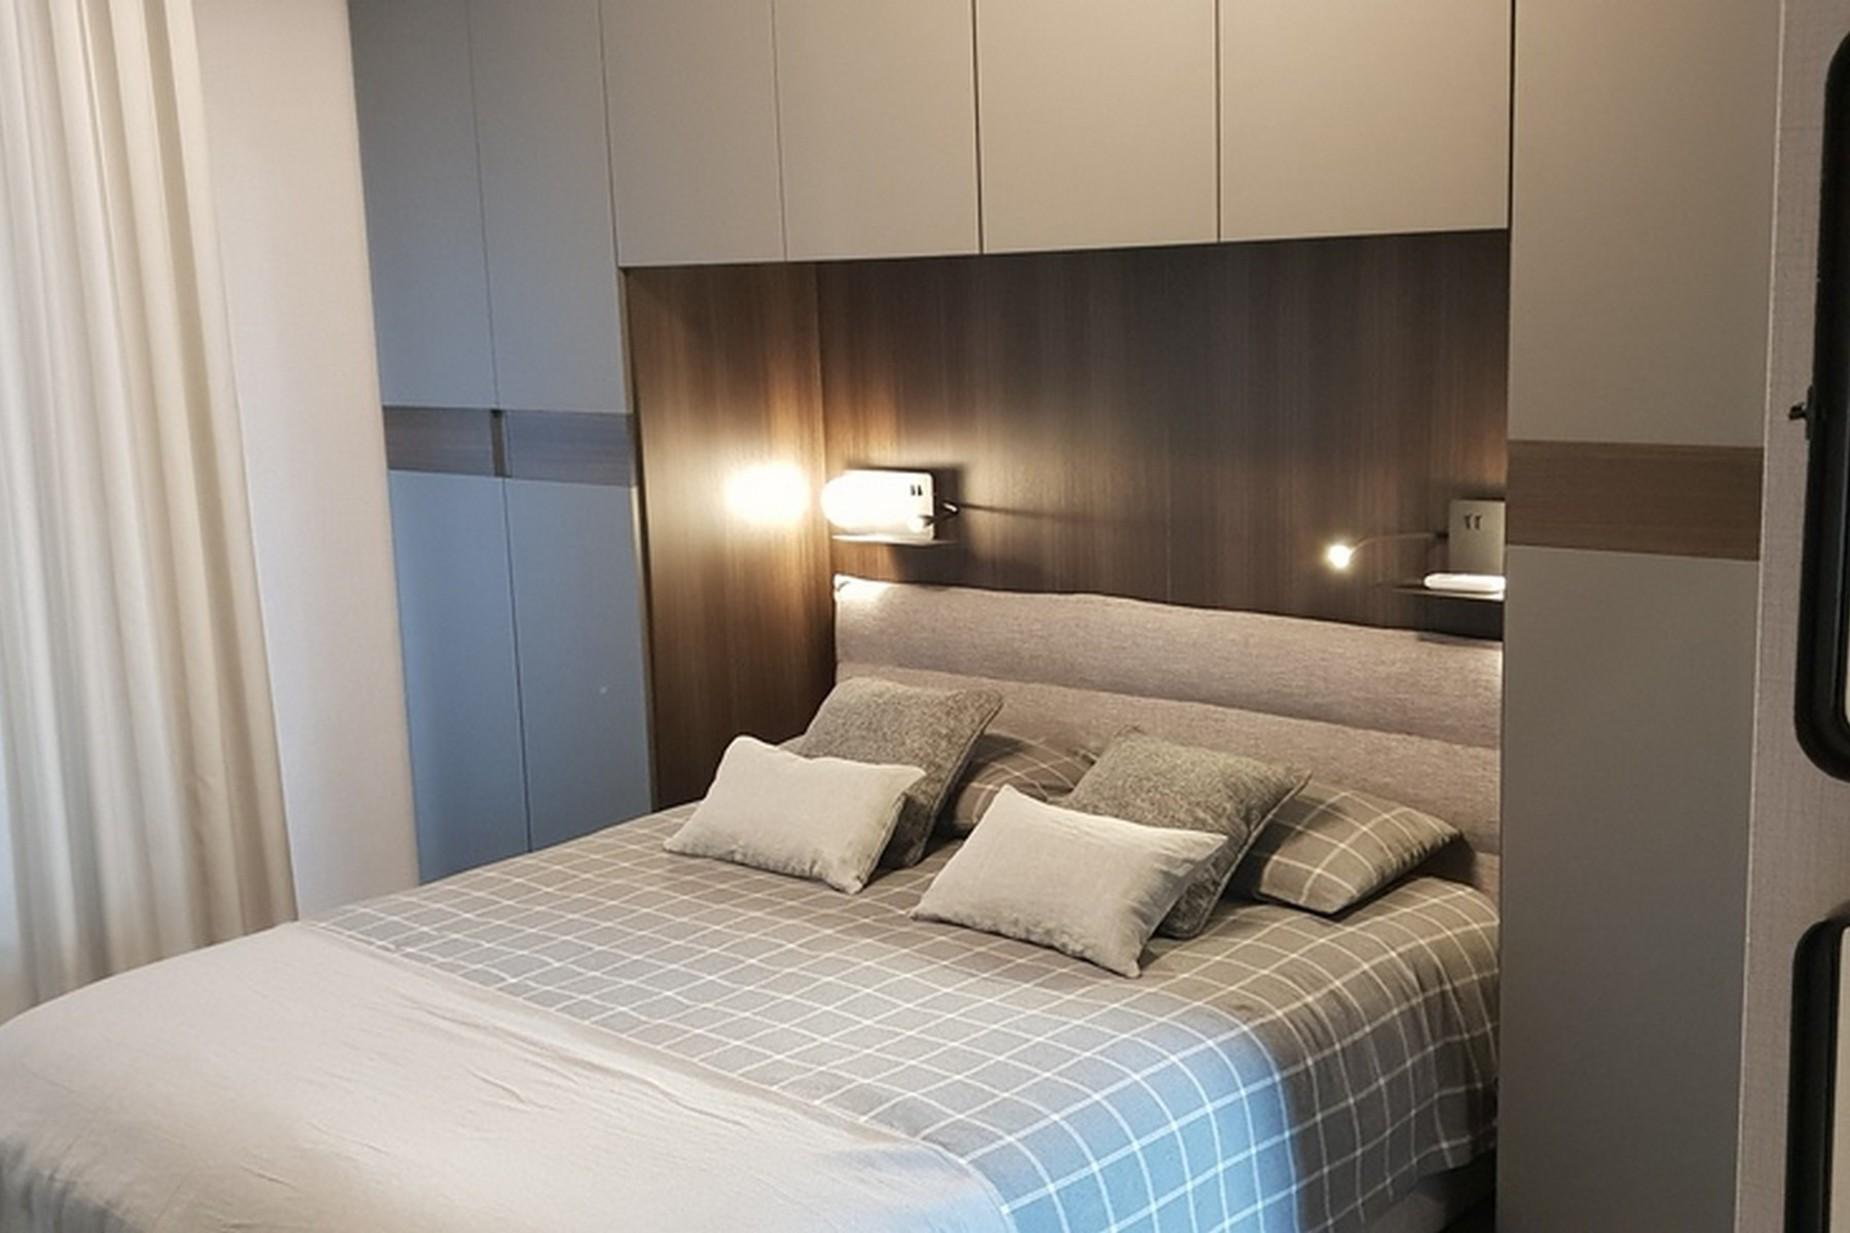 2 bed Apartment For Rent in Birkirkara, Birkirkara - thumb 5